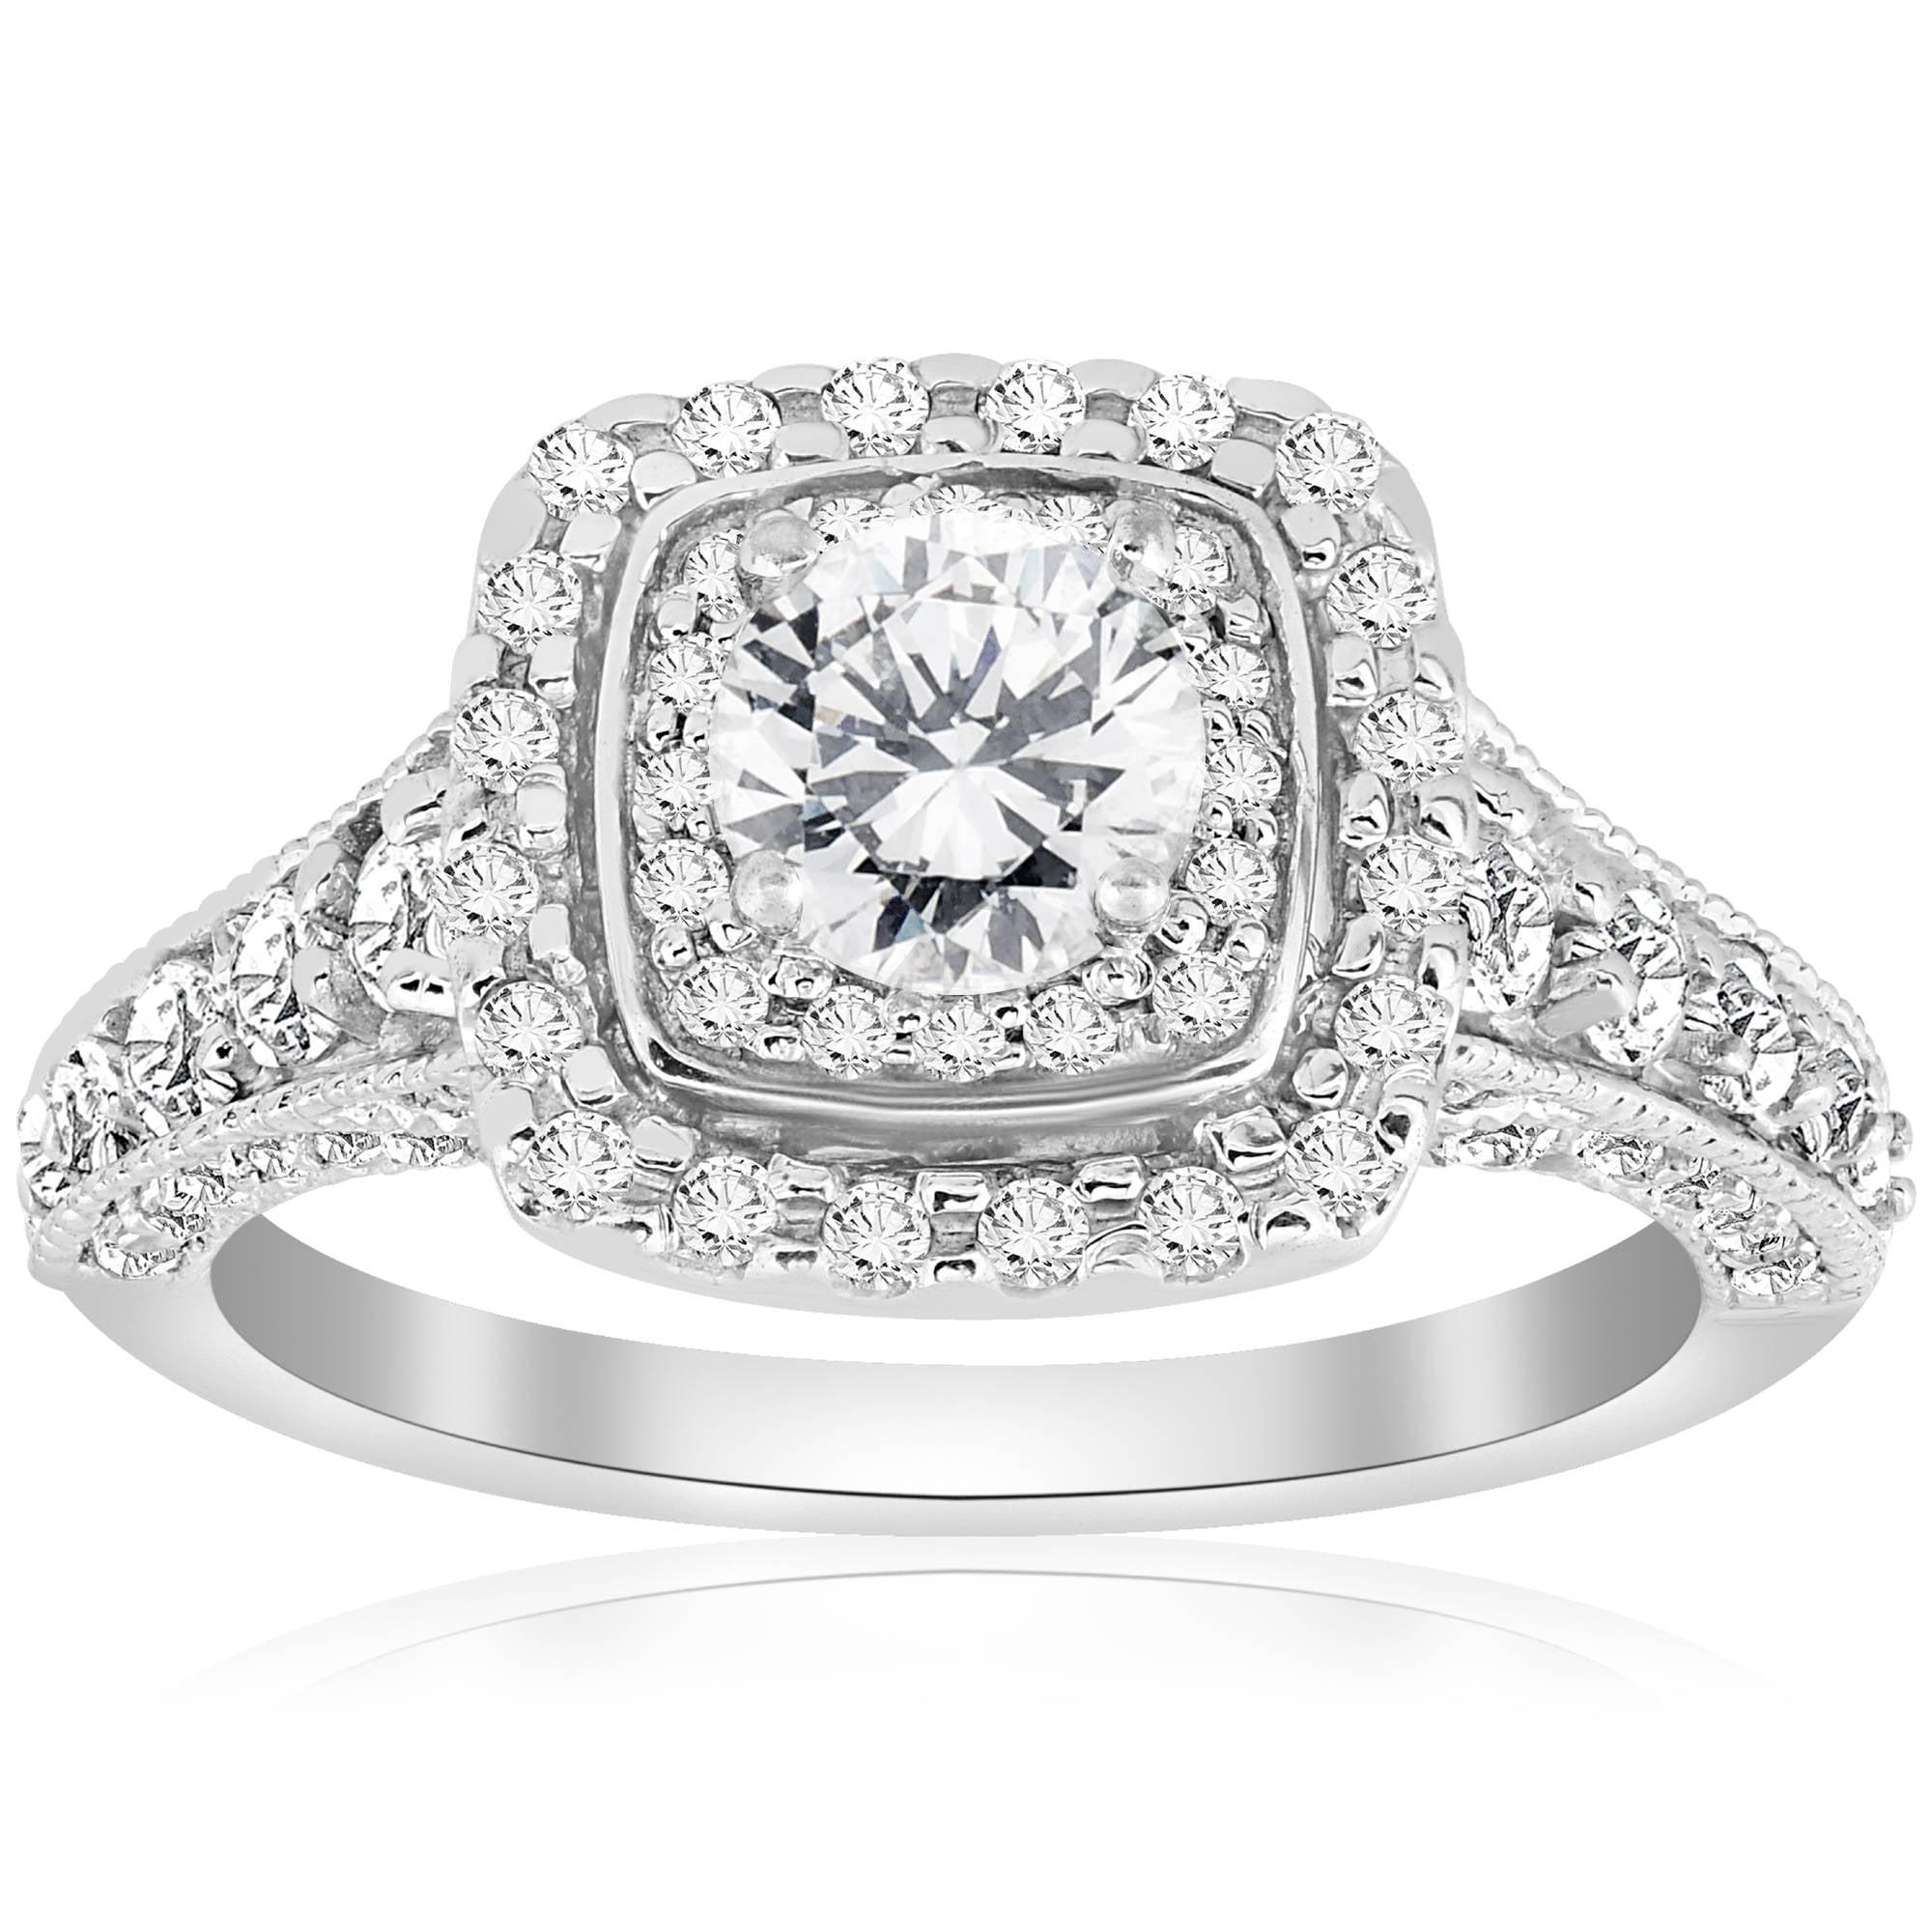 1 1 2ct Double Halo Cushion Vintage Diamond Engagement Ring 14K White Gold by Pompeii3